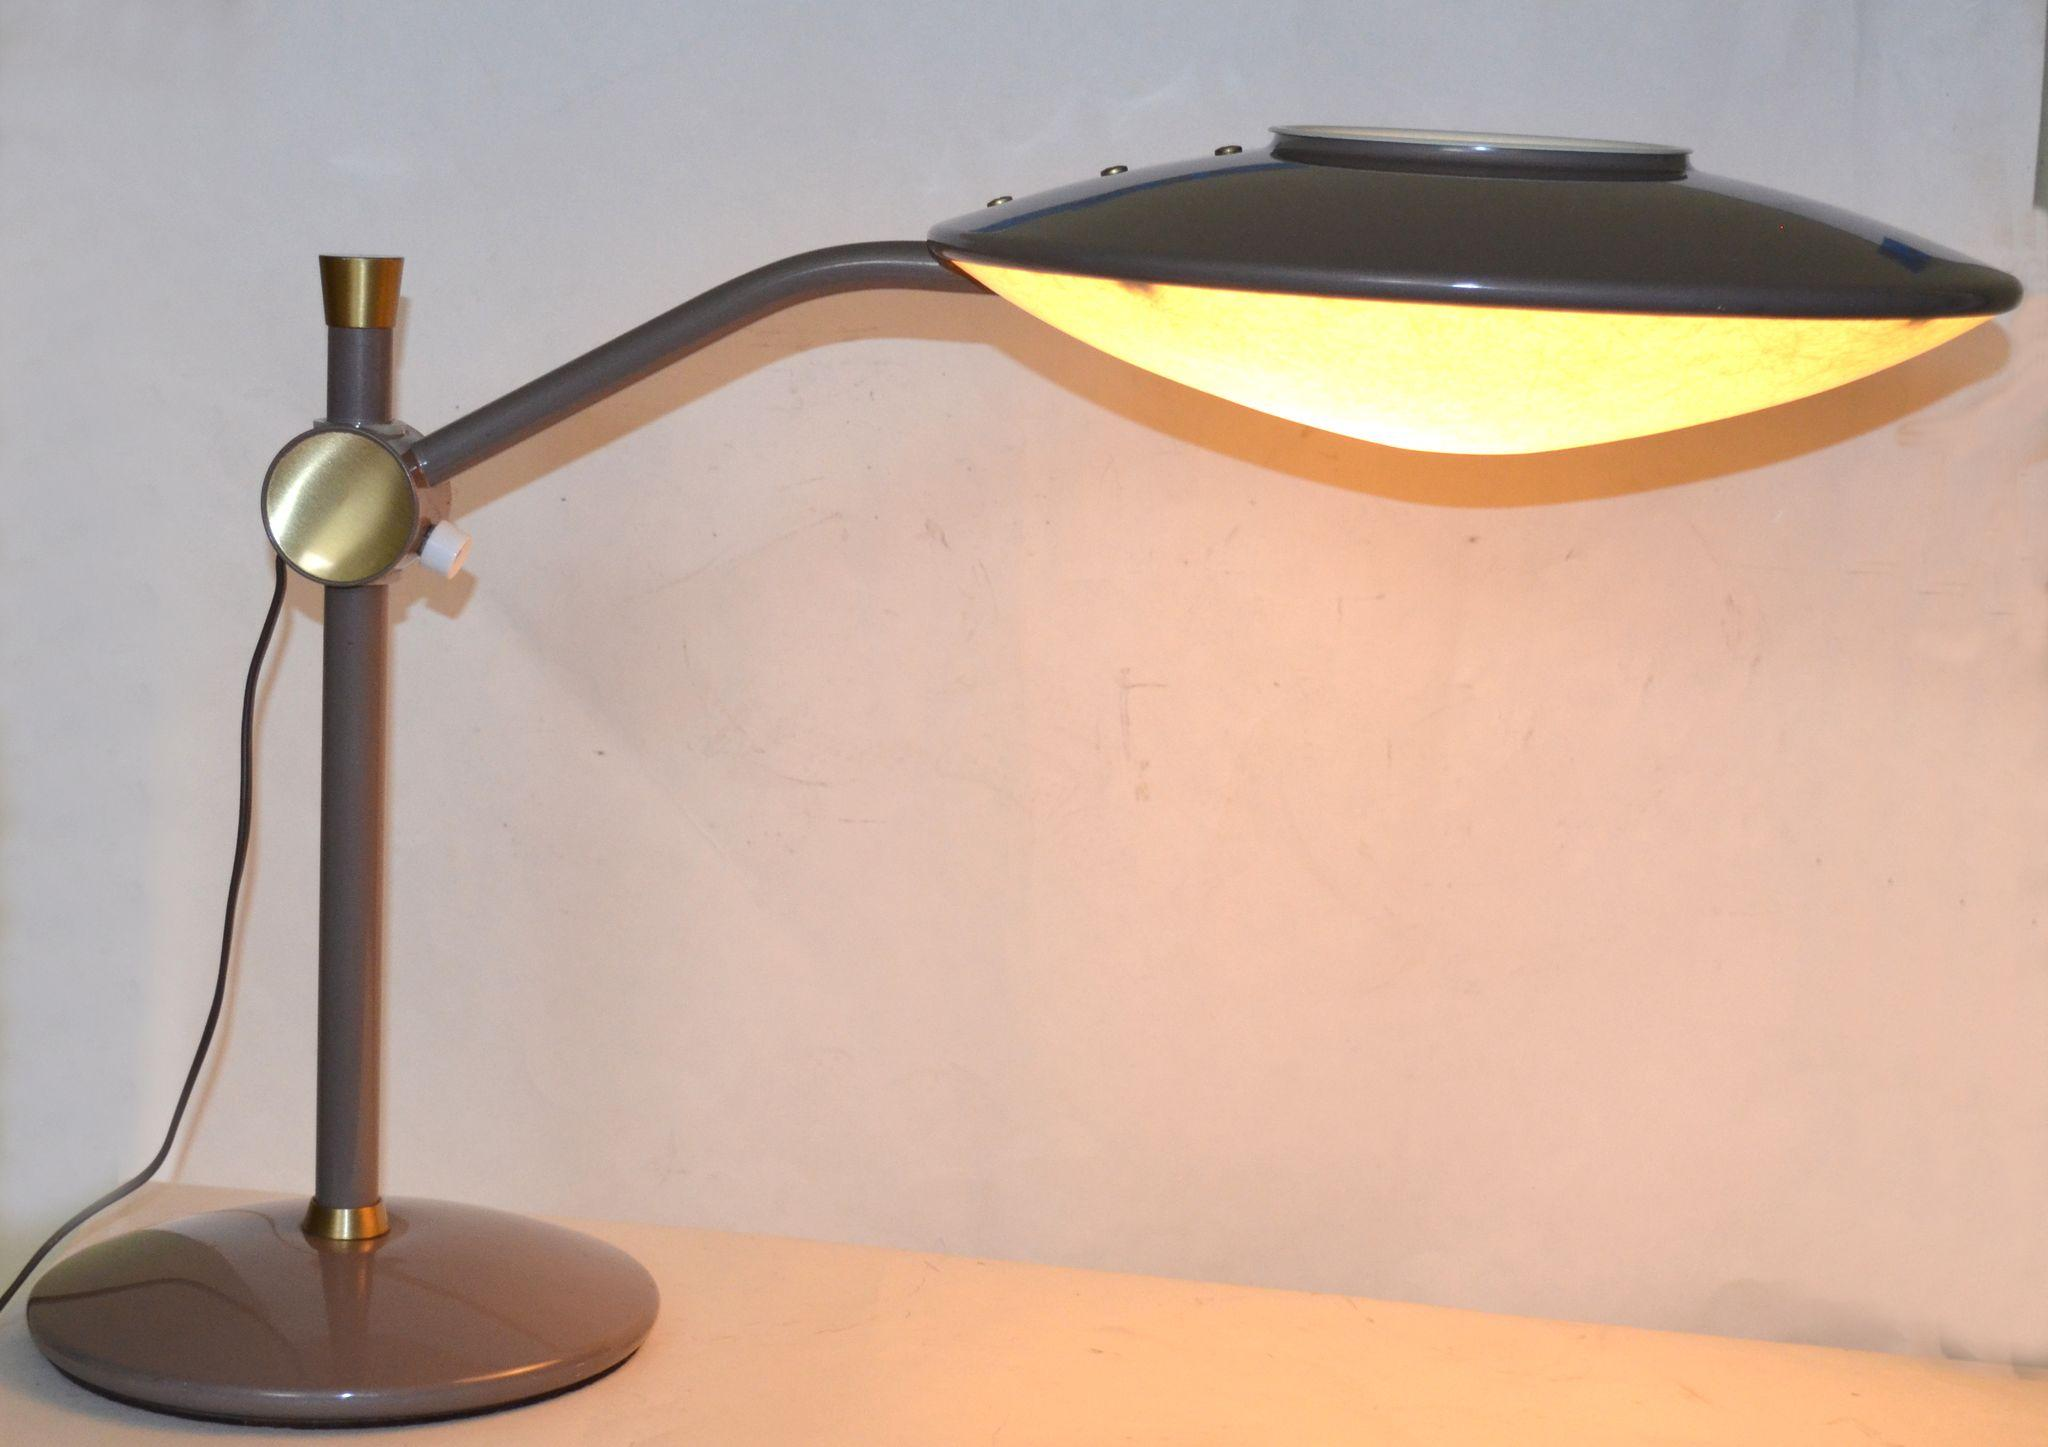 dazor model 2008 mid century modern desk lamp from. Black Bedroom Furniture Sets. Home Design Ideas